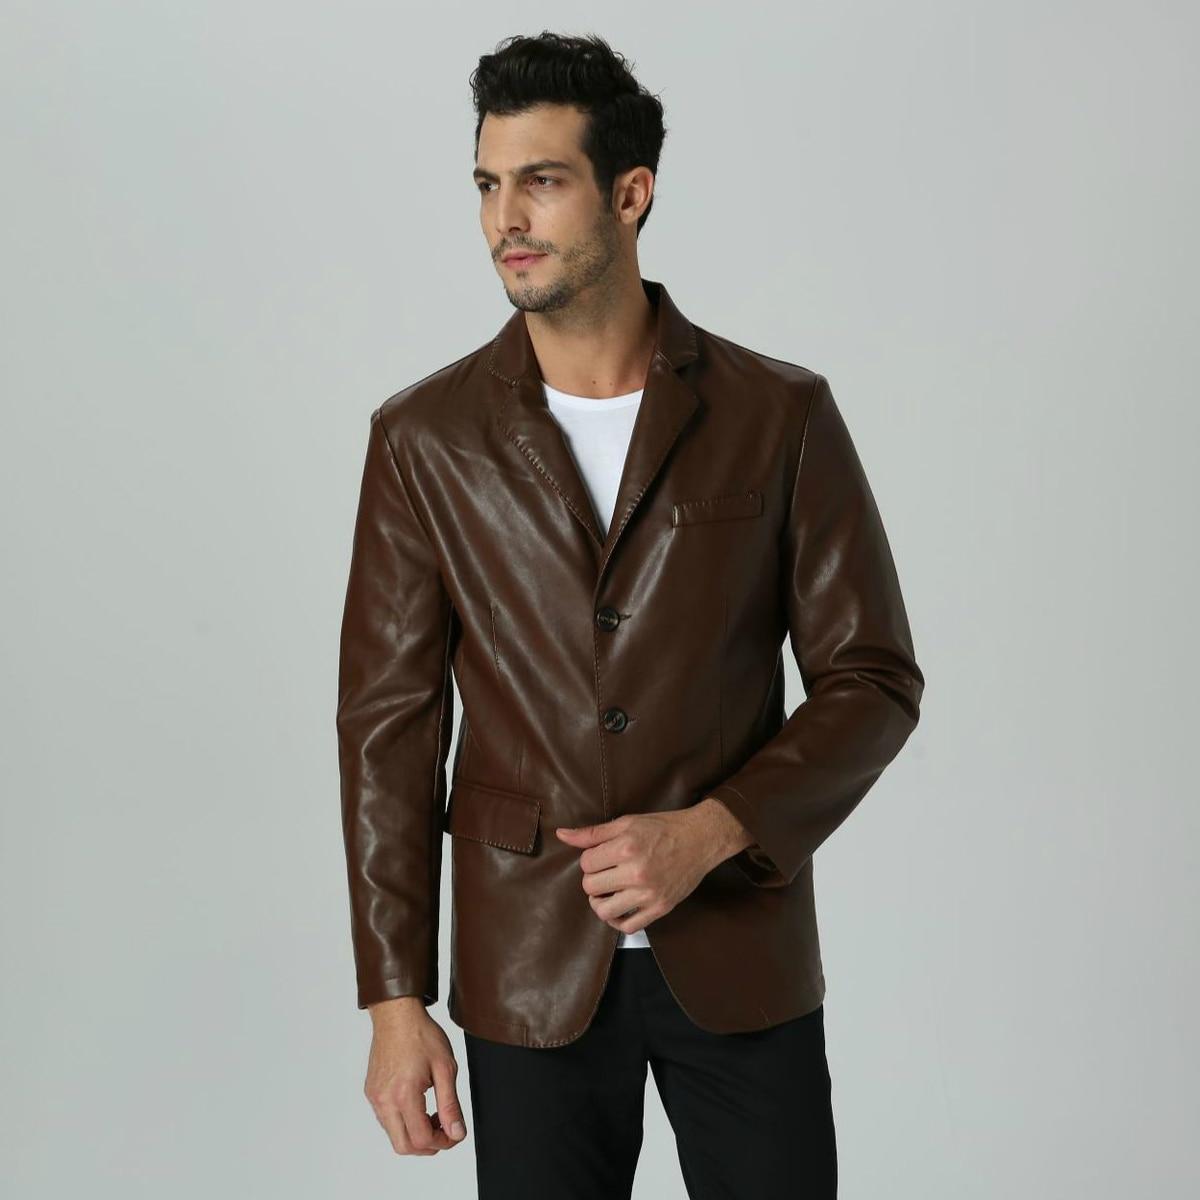 Hot Faux Leather Brown Men Blazer Casual Business PU Leather Slim Fit Plus Size Suit Jacket For Boy Long Sleeve Male Suit Blazer